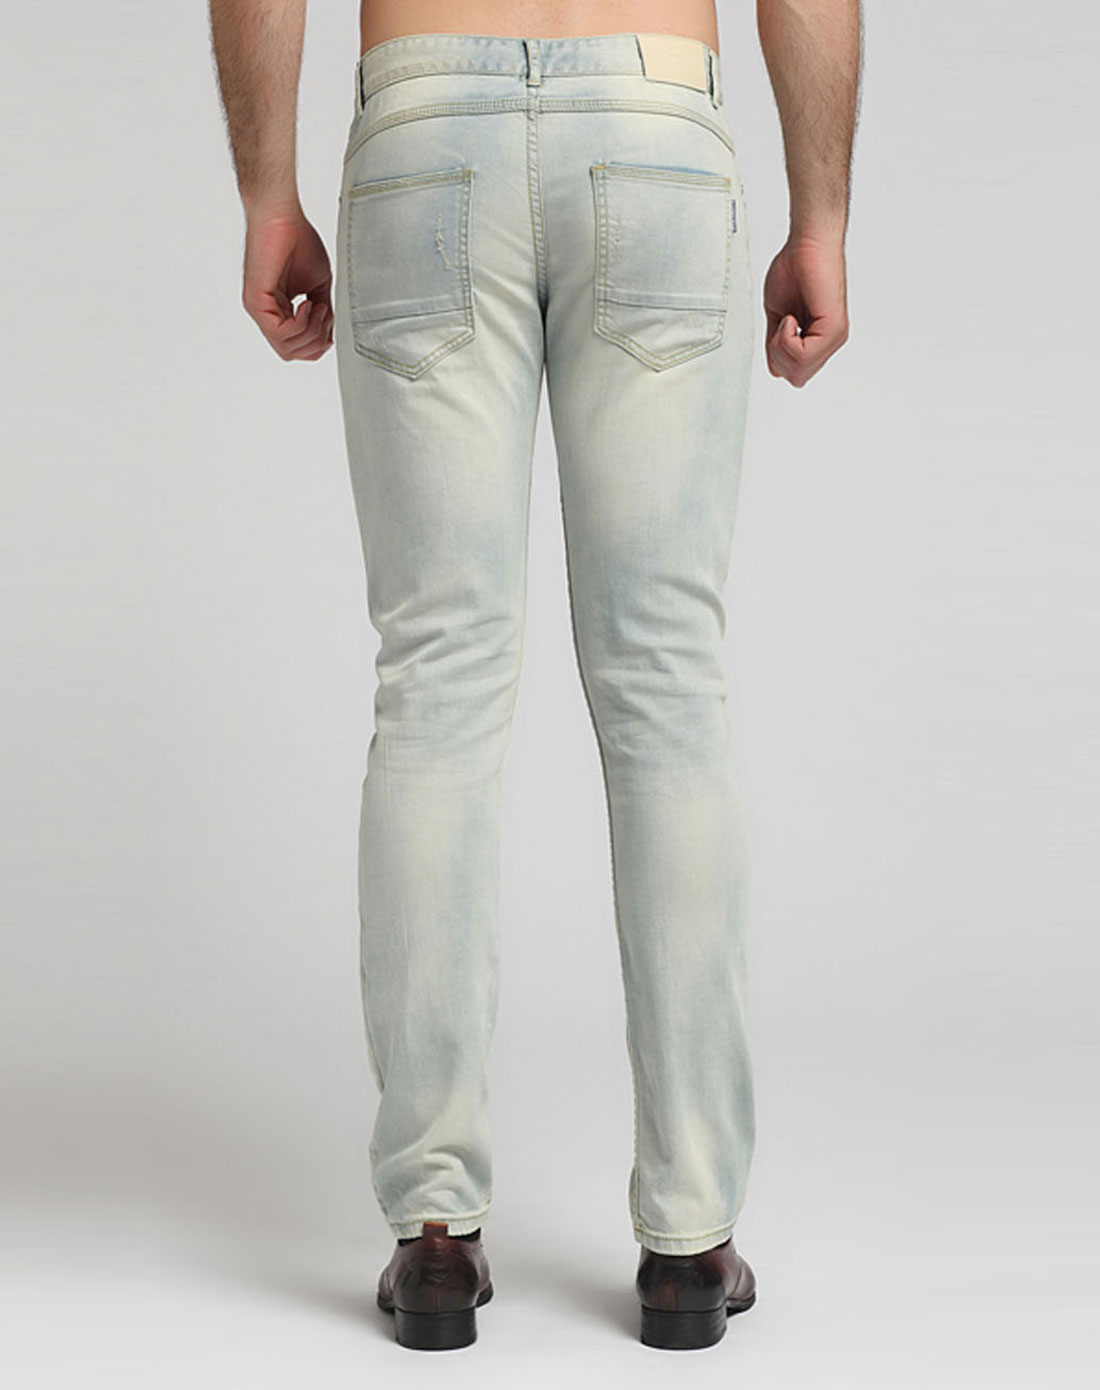 jeans男女装经典水洗男款窄脚牛仔裤